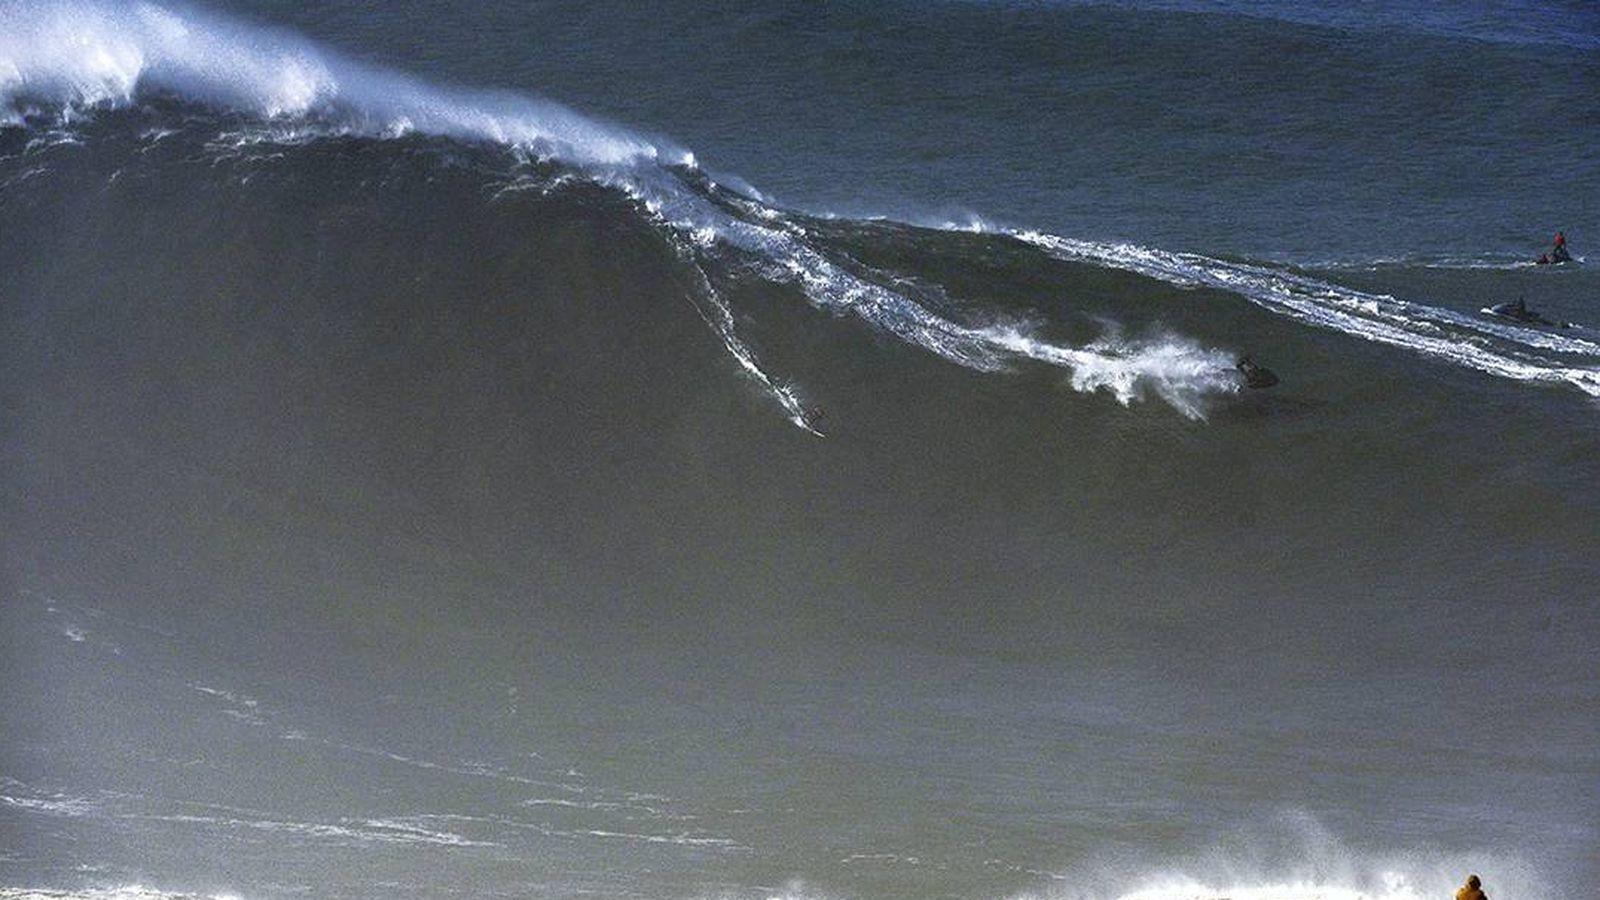 Foto: Axi Muniain, sobre la ola 'XXXL' del pasado 18 de enero. (Foto: Rafa Riancho)